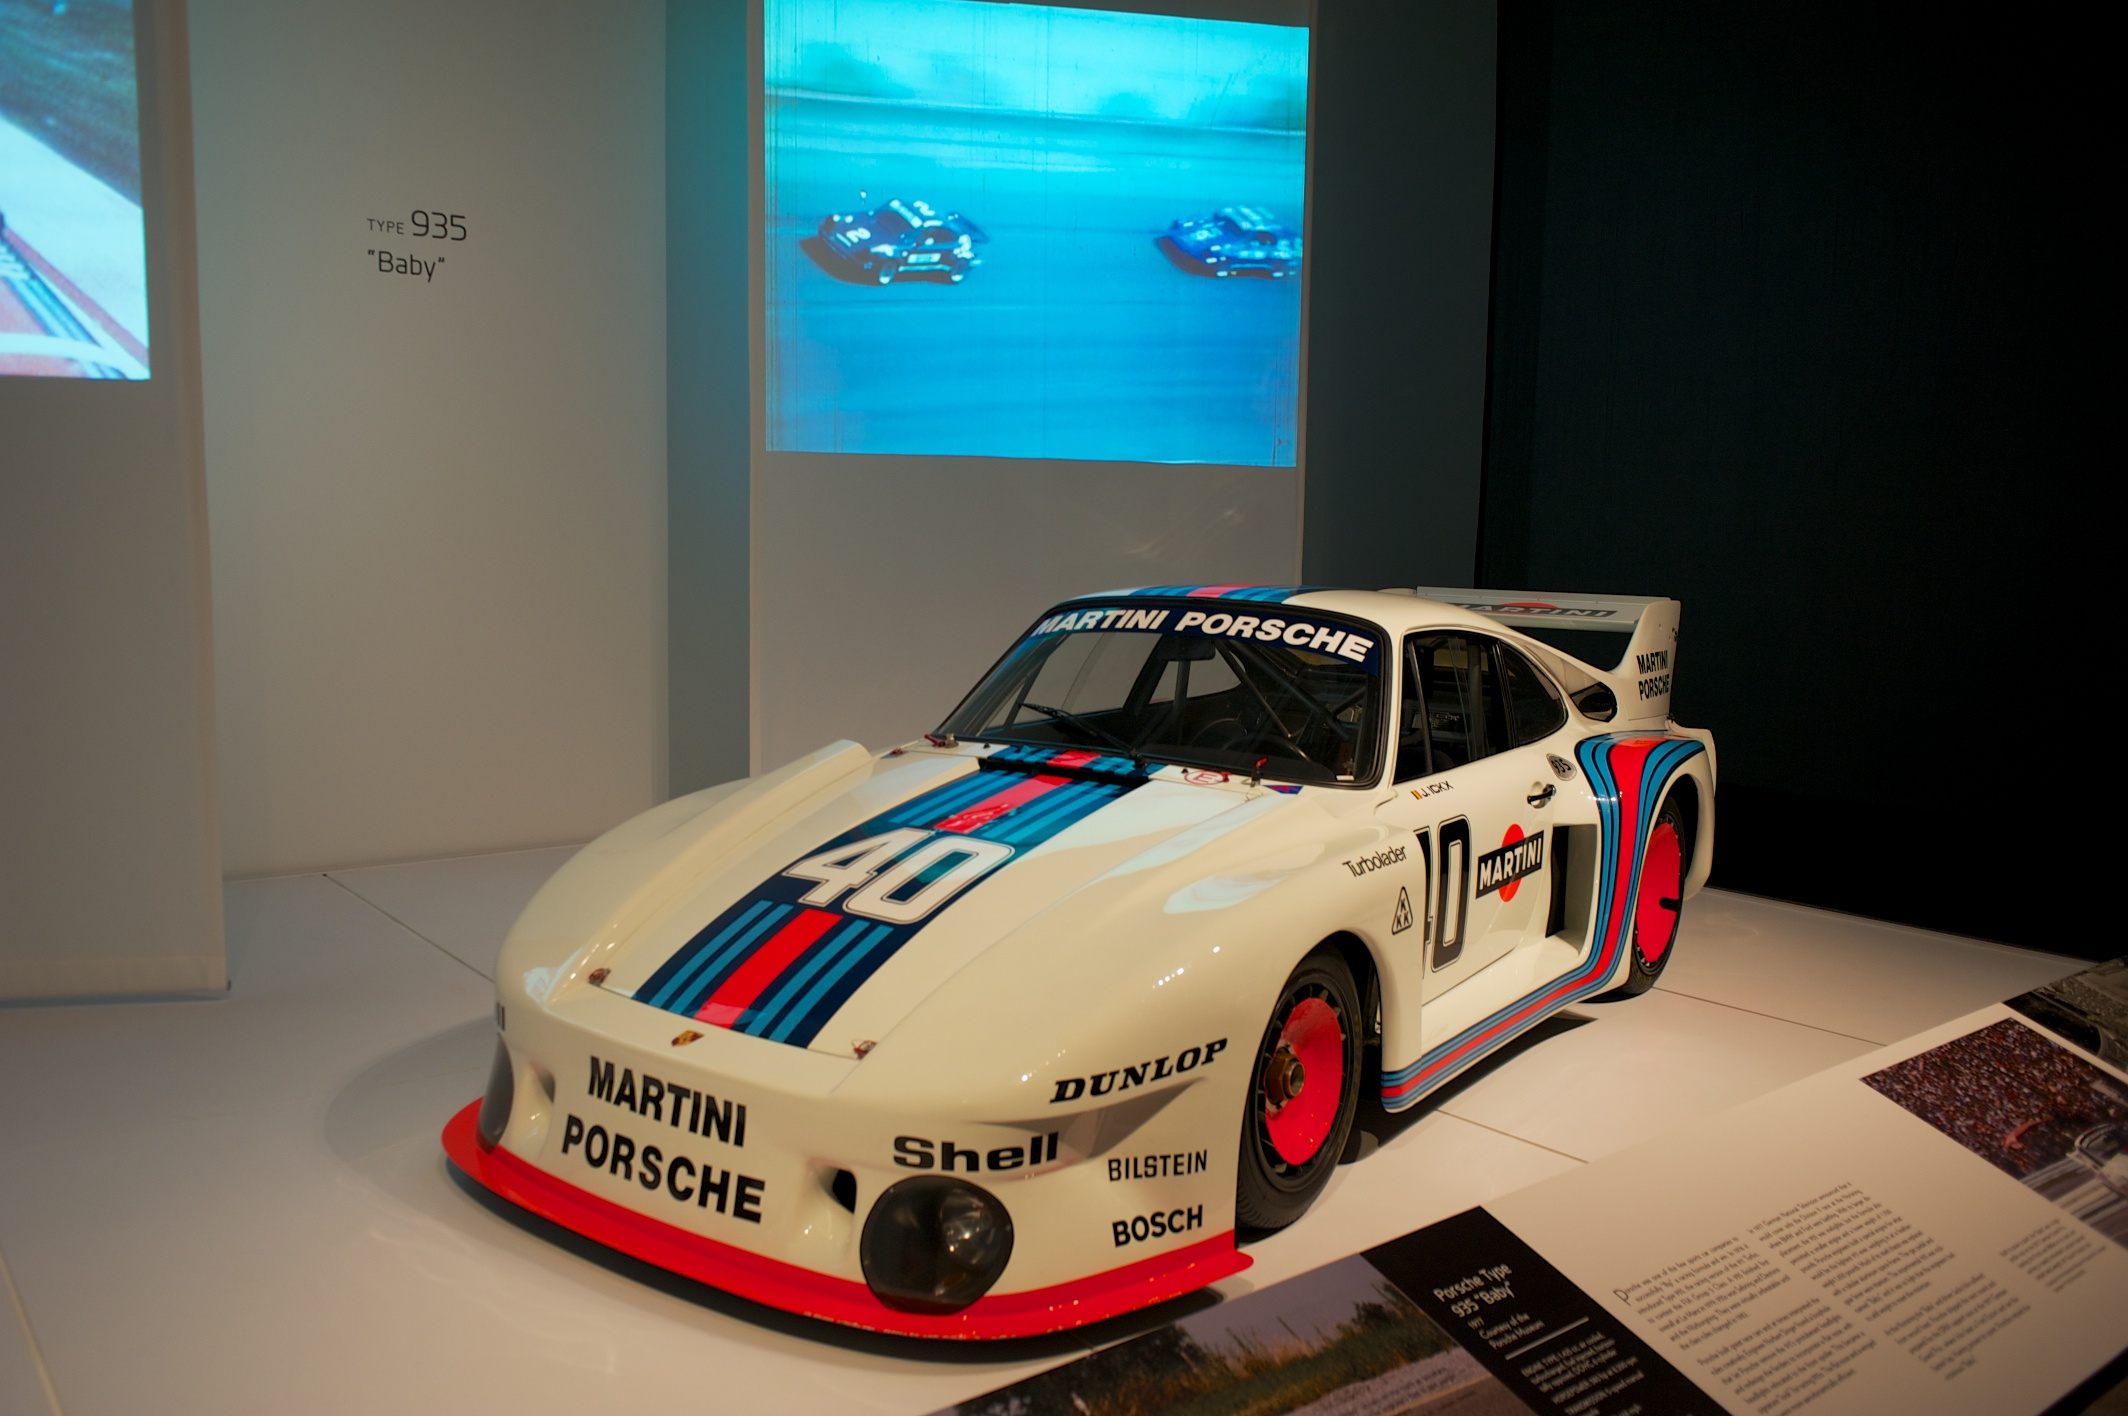 PorscheByDesign 26